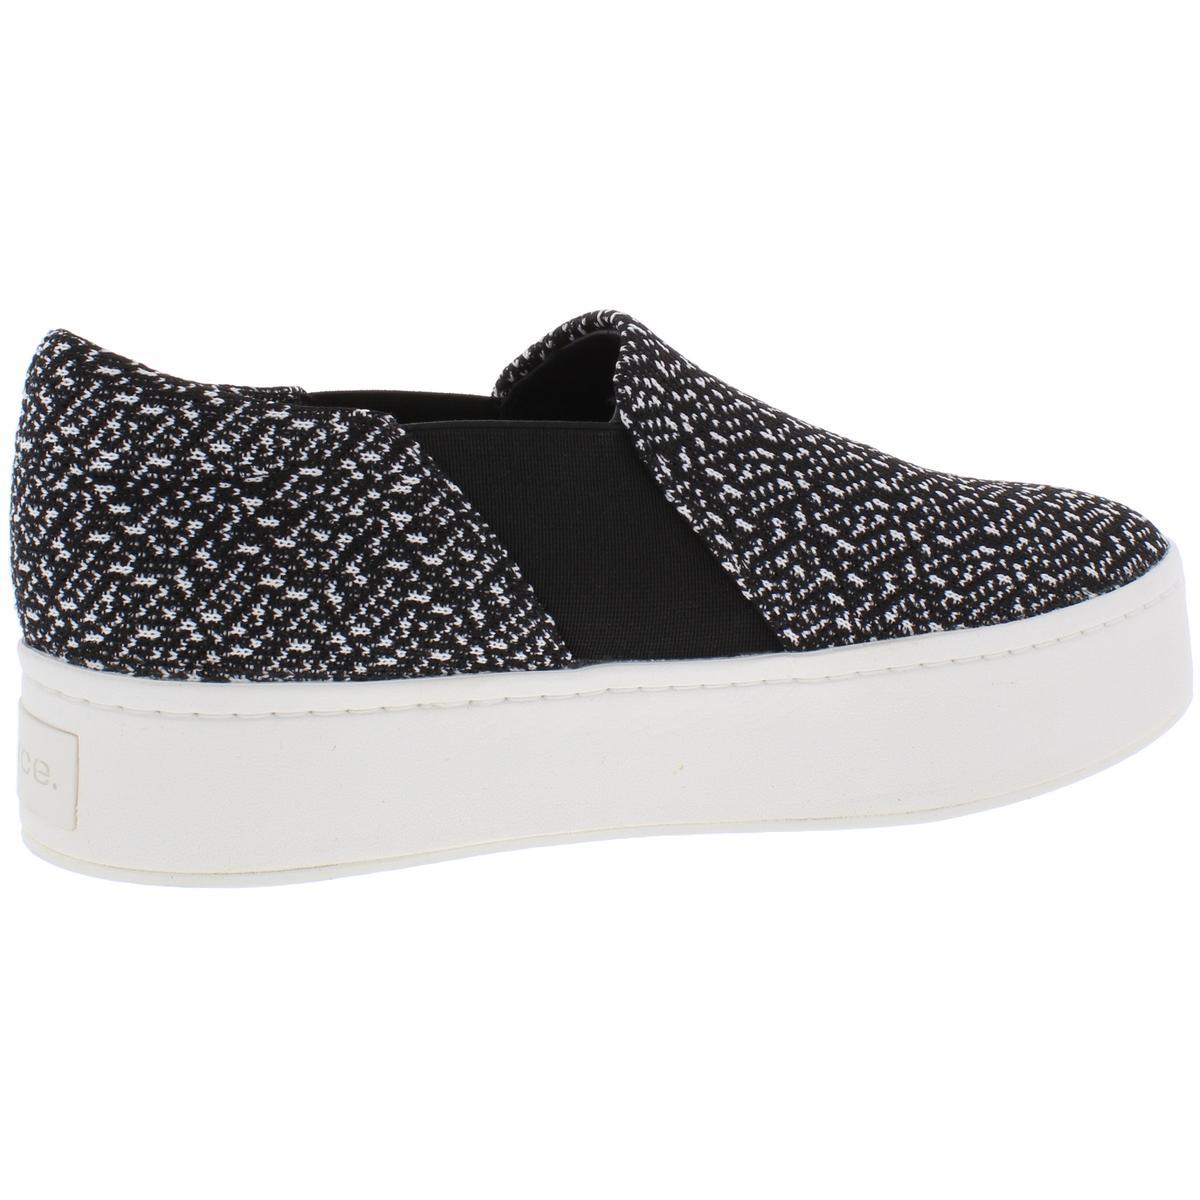 Vince-Womens-Warren-Solid-Flatform-Casual-Shoes-BHFO-6337 thumbnail 4